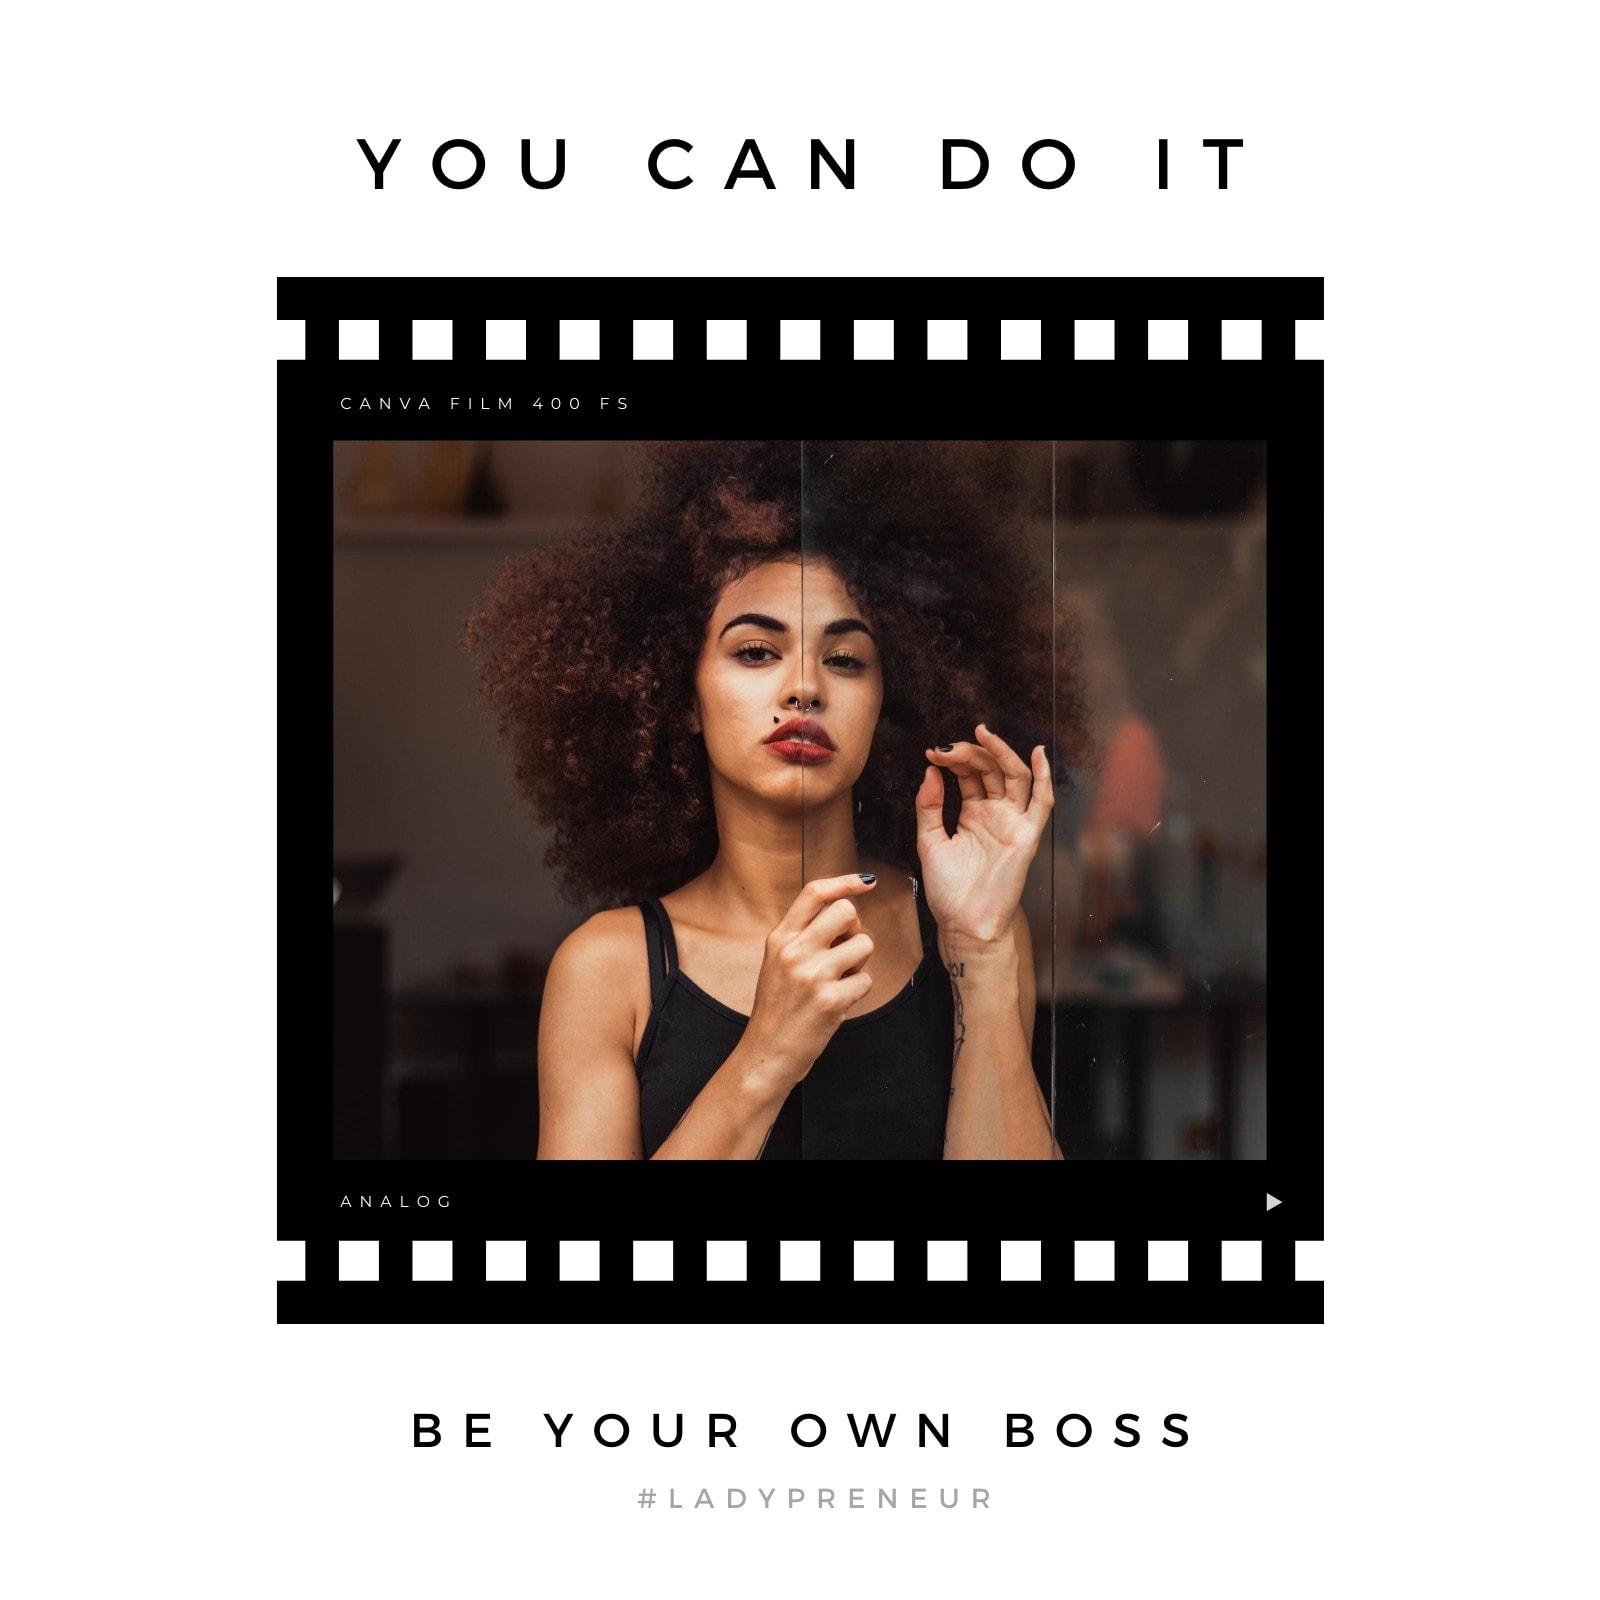 Minimalist Film Small Business Motivational Quote Social Media Post